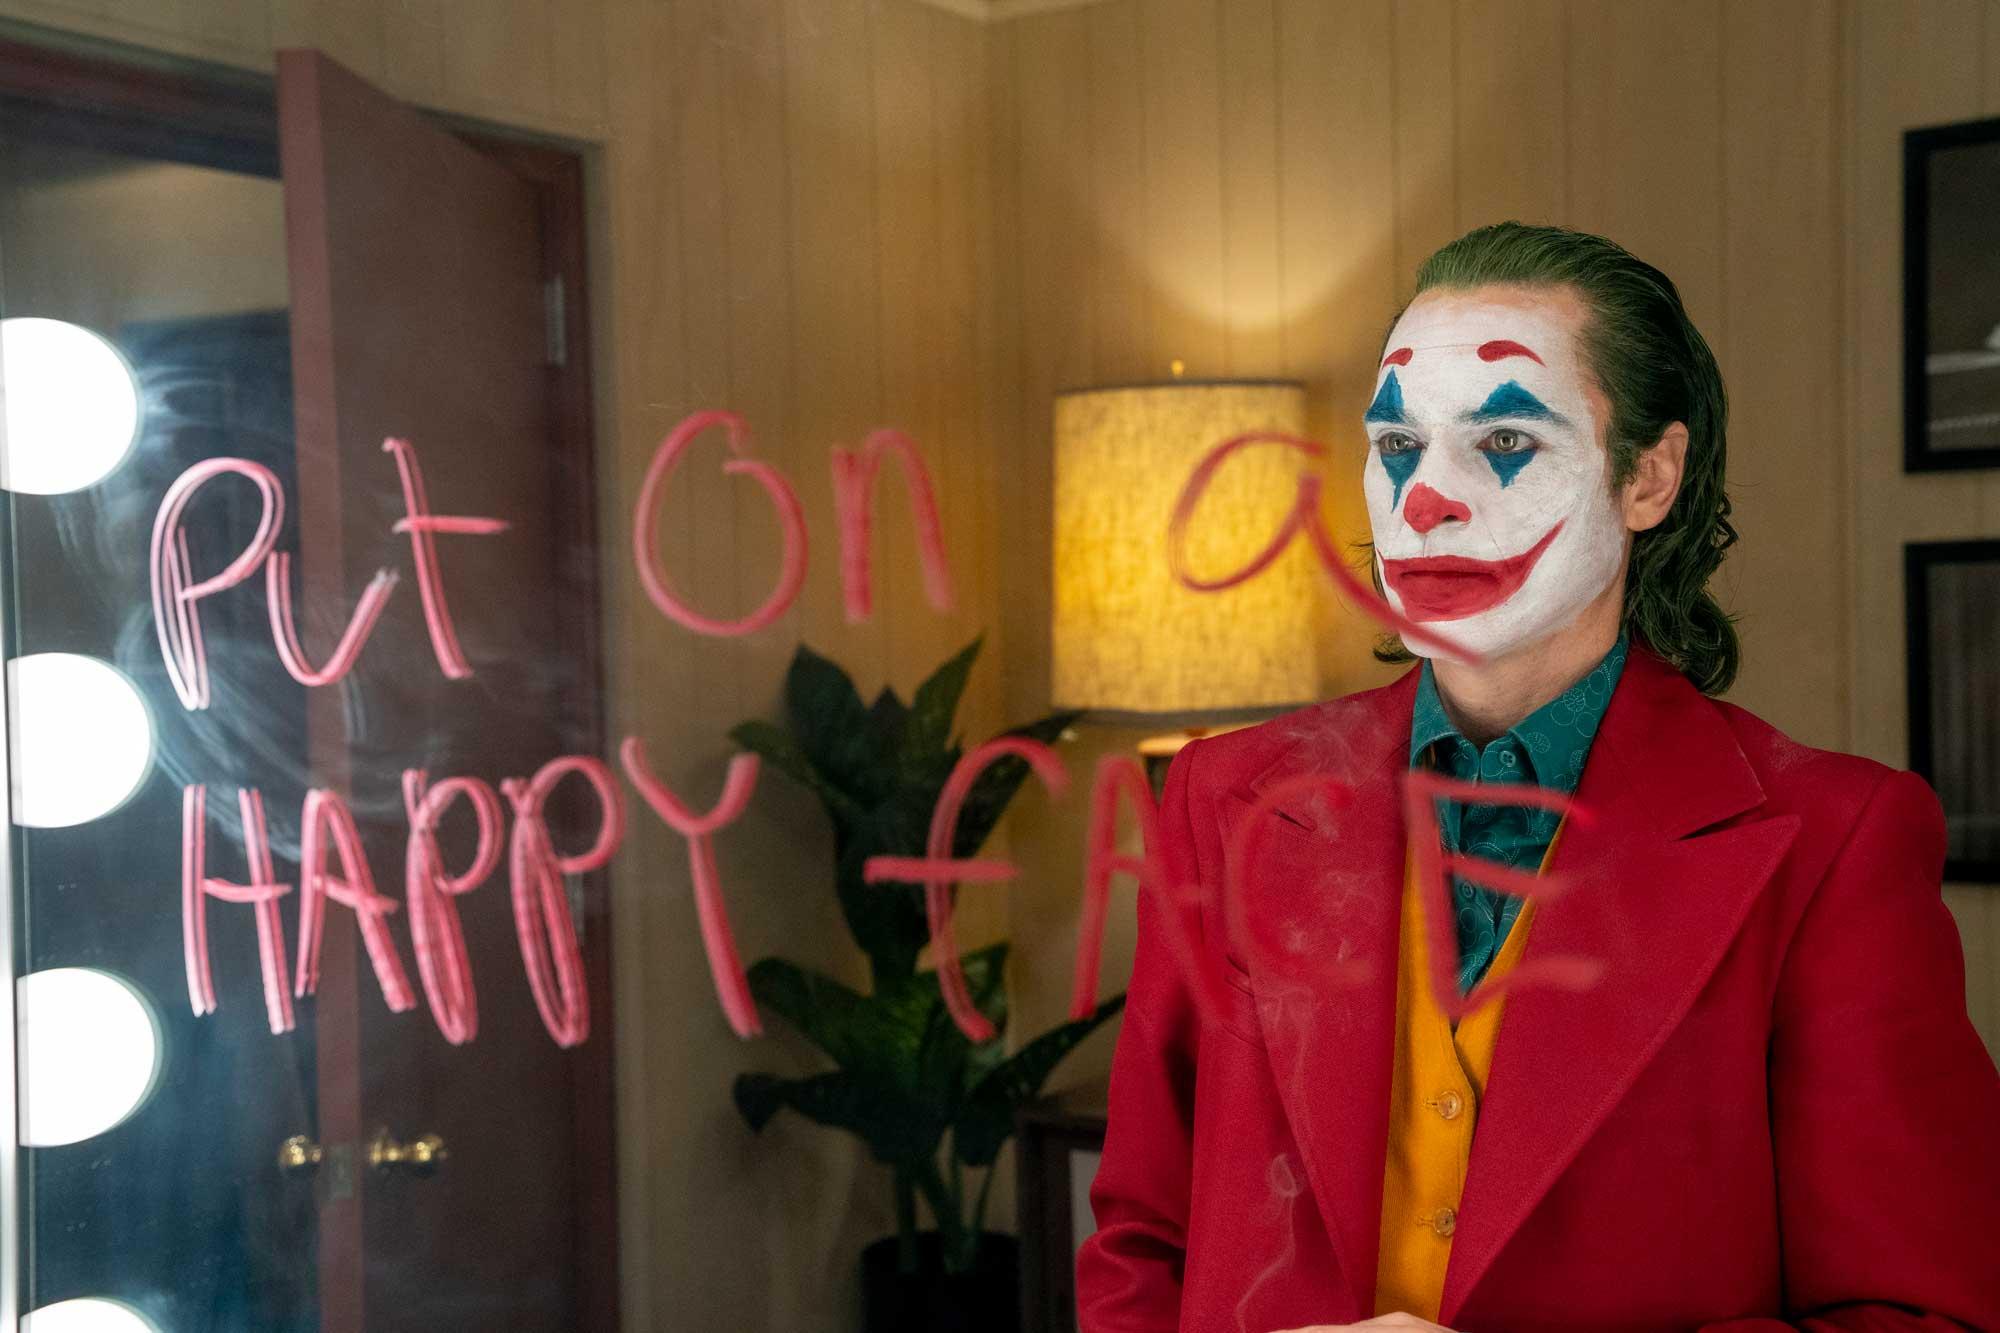 Joker incassi record